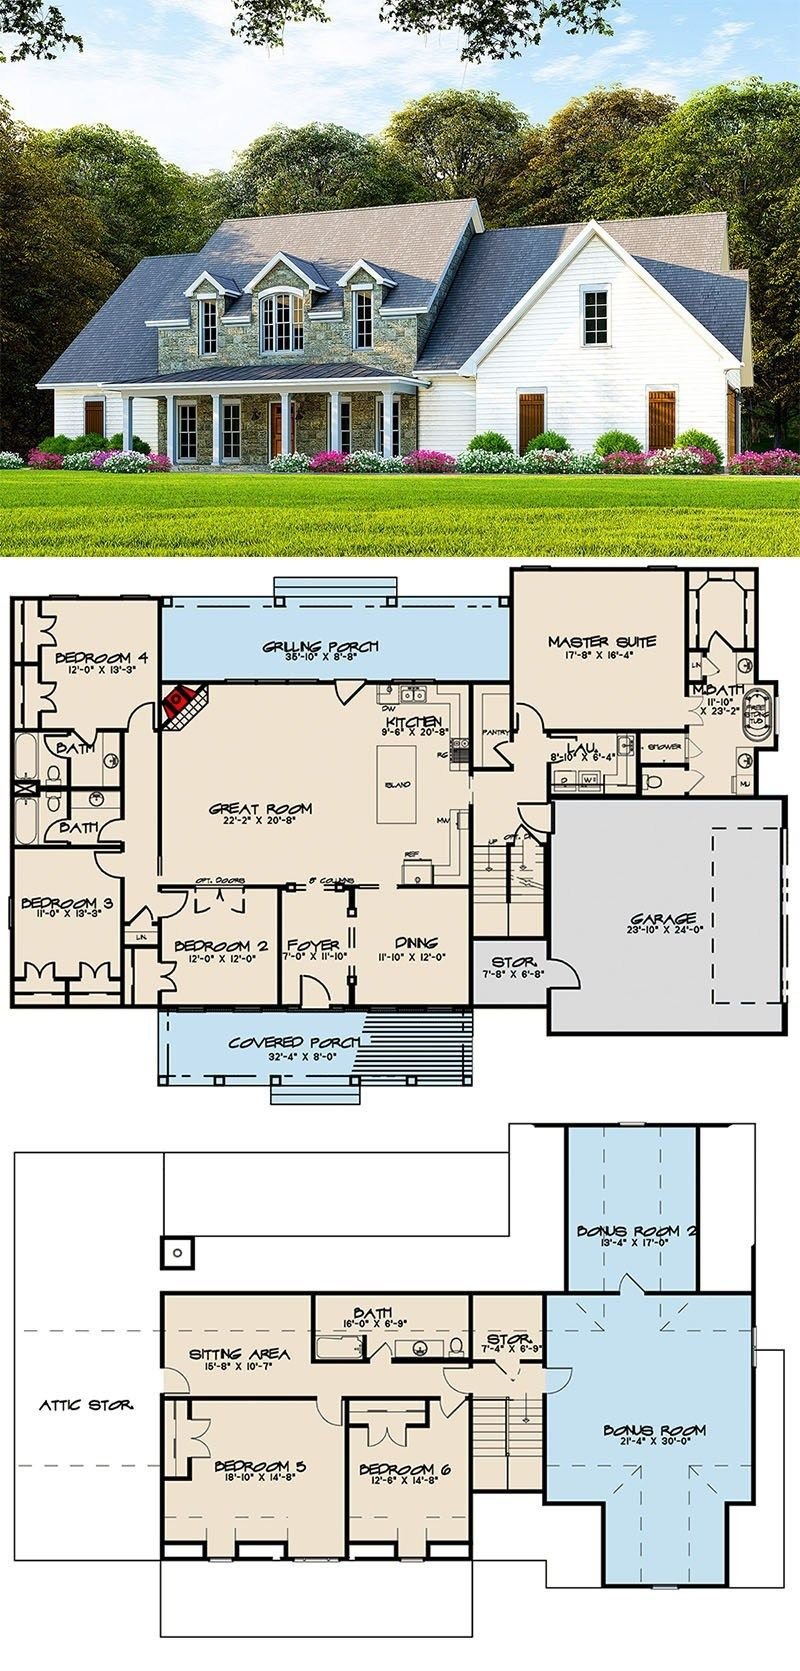 7 Most Popular Farmhouse Plans With Pictures Nikki S Plate House Plans Farmhouse Pool House Plans Farmhouse Plans